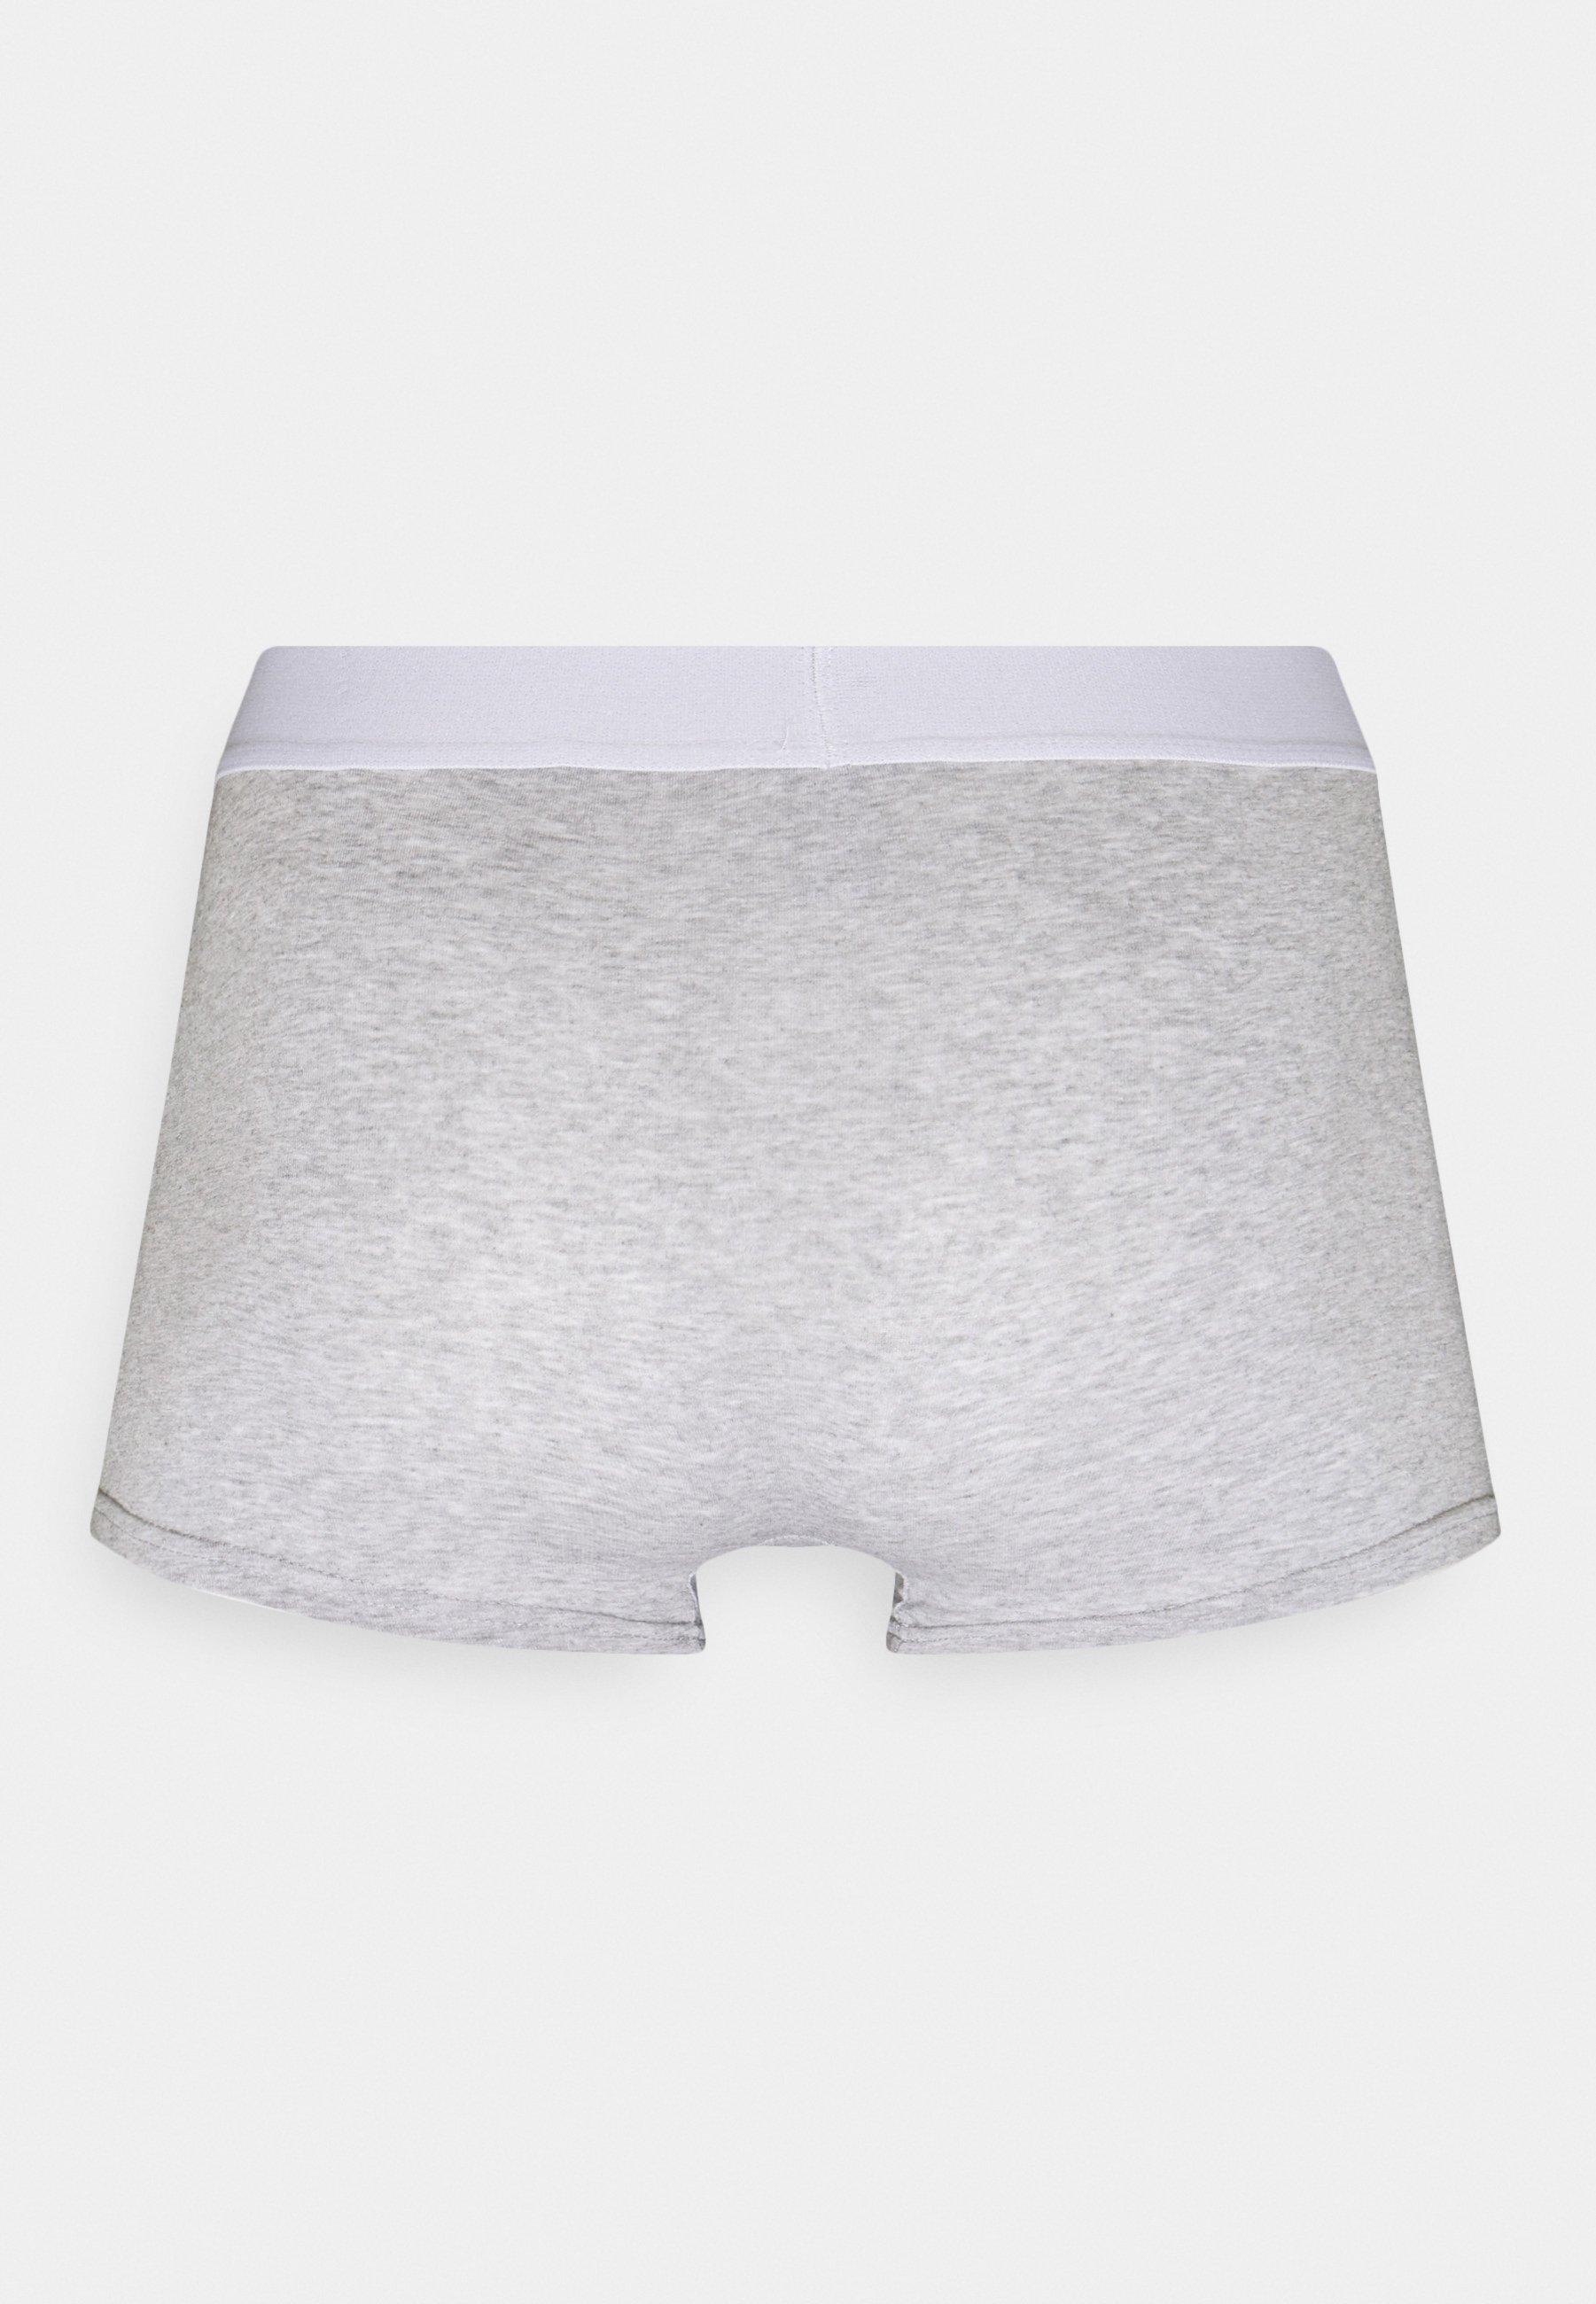 Herren SMALL SIGNATURE ESSENTIAL BRIEFS 3 PACK - Panties